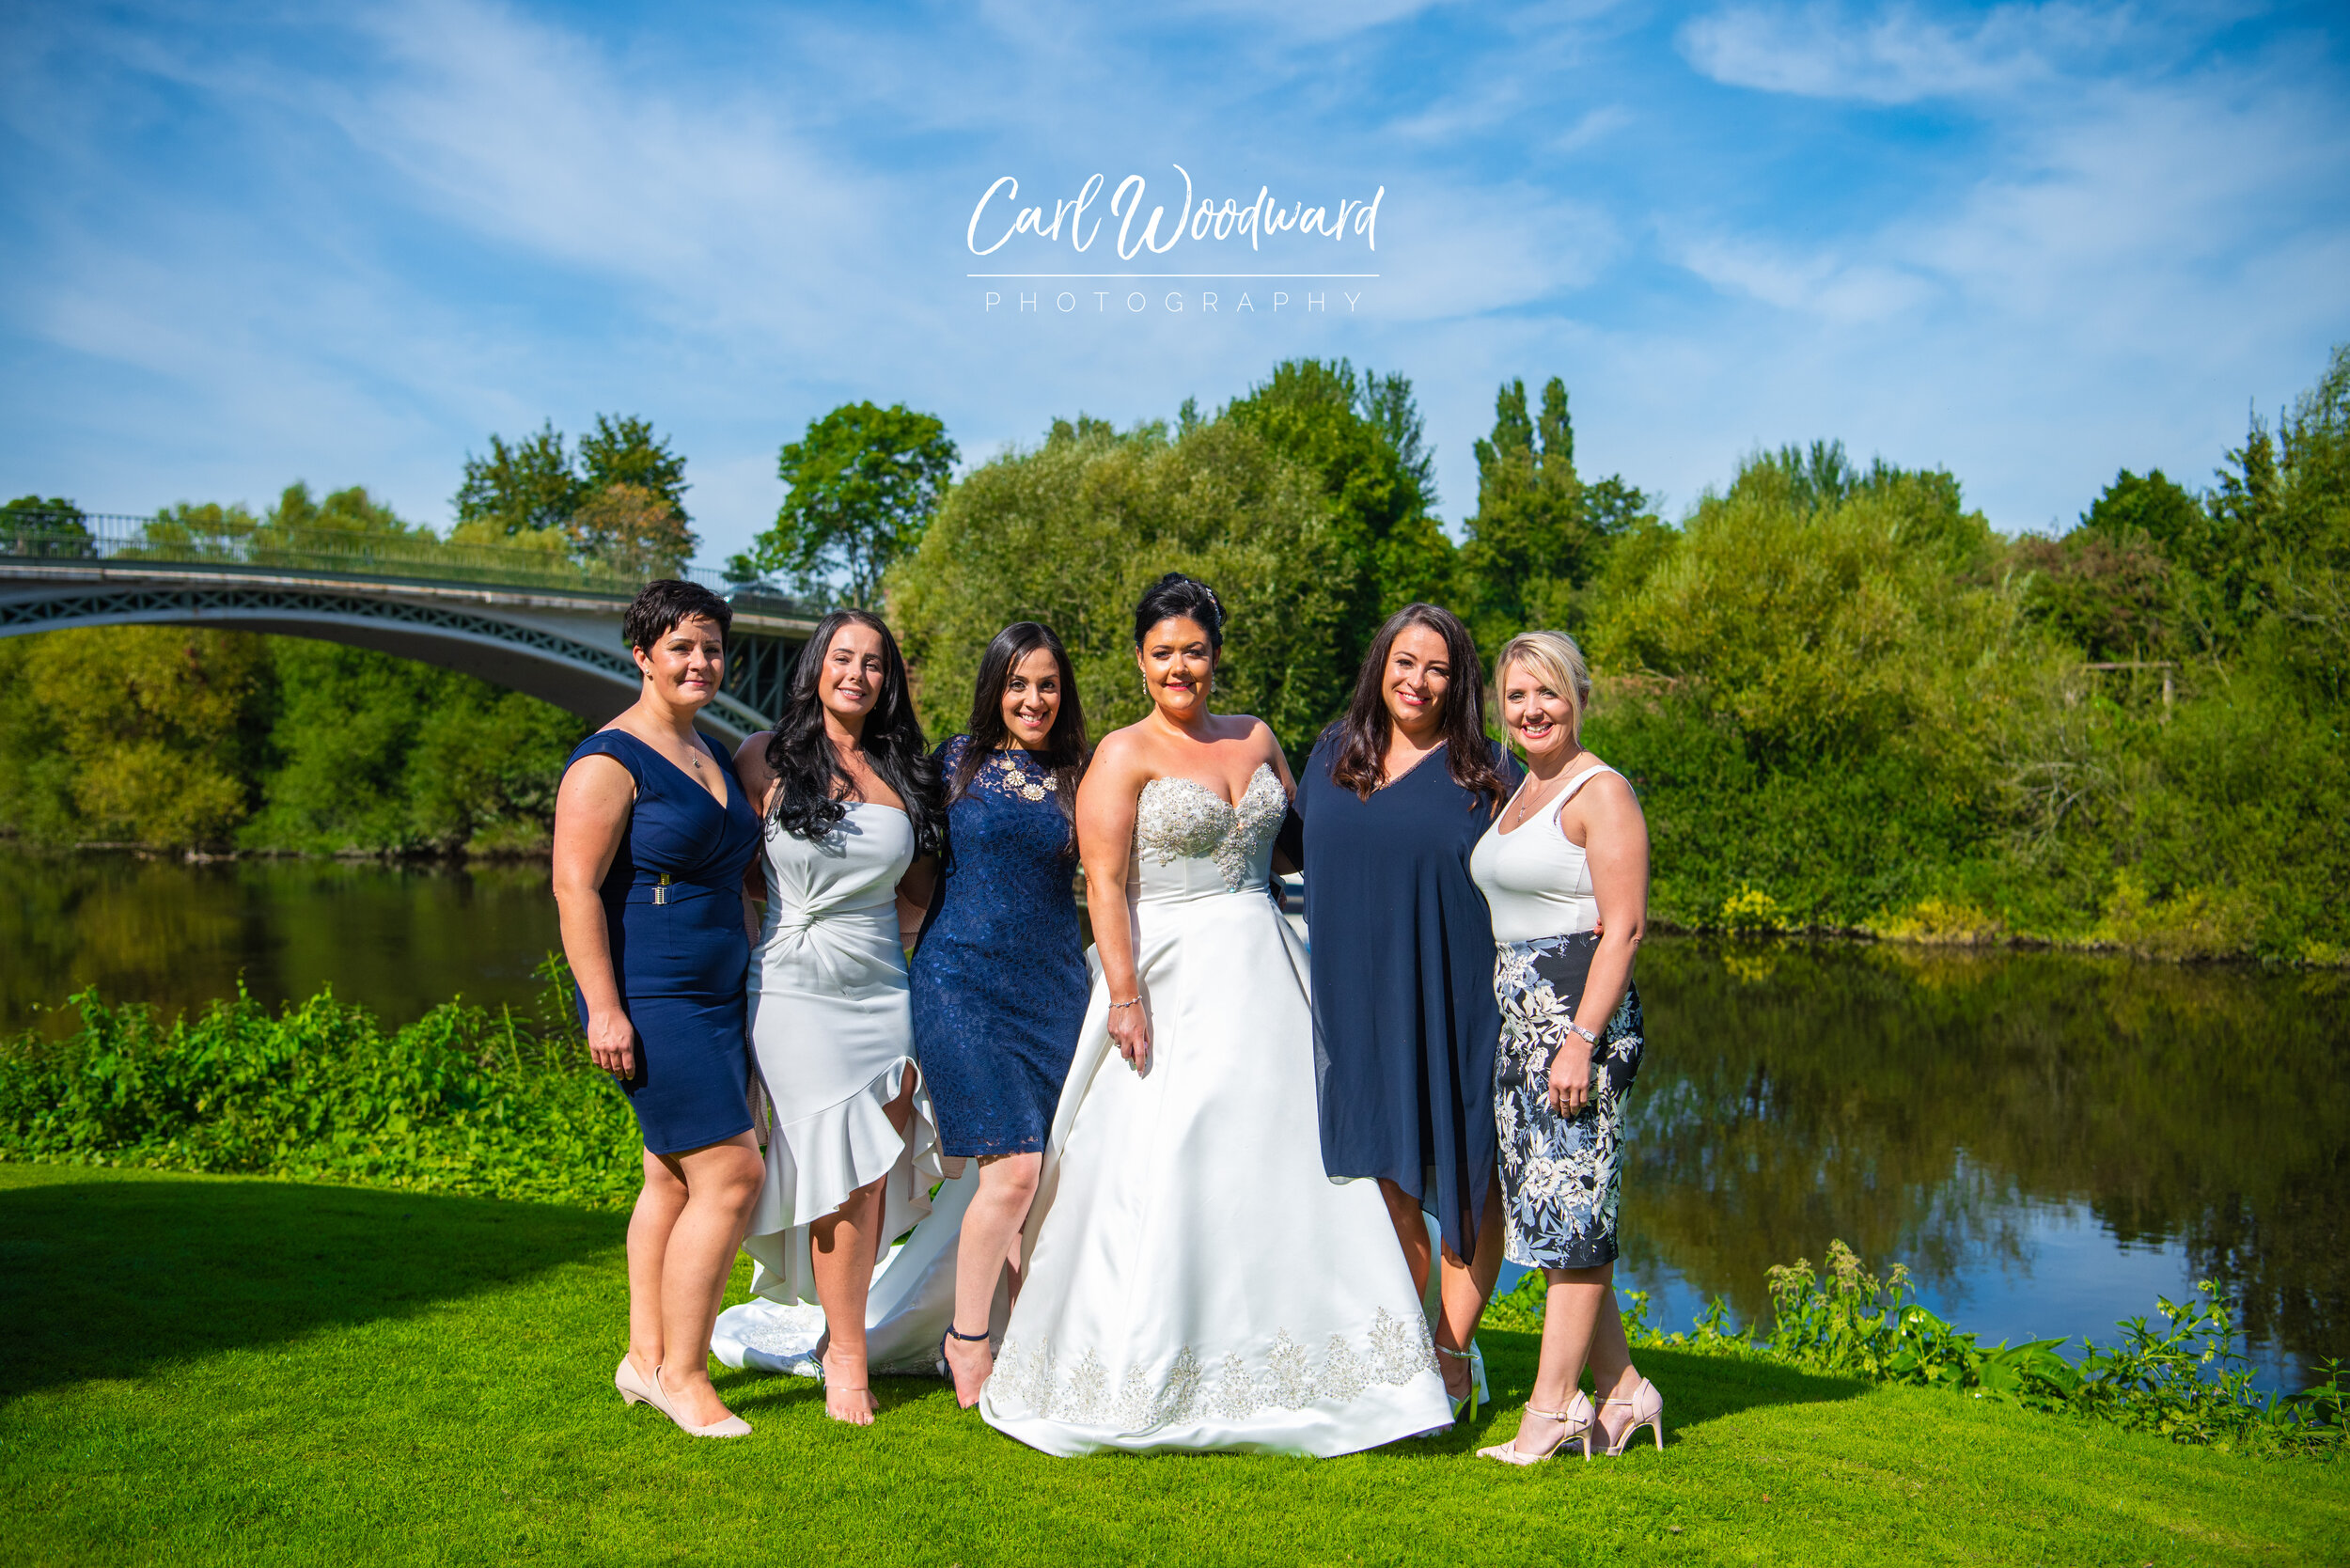 017-The-Holt-Fleet-Wedding-Photos.jpg